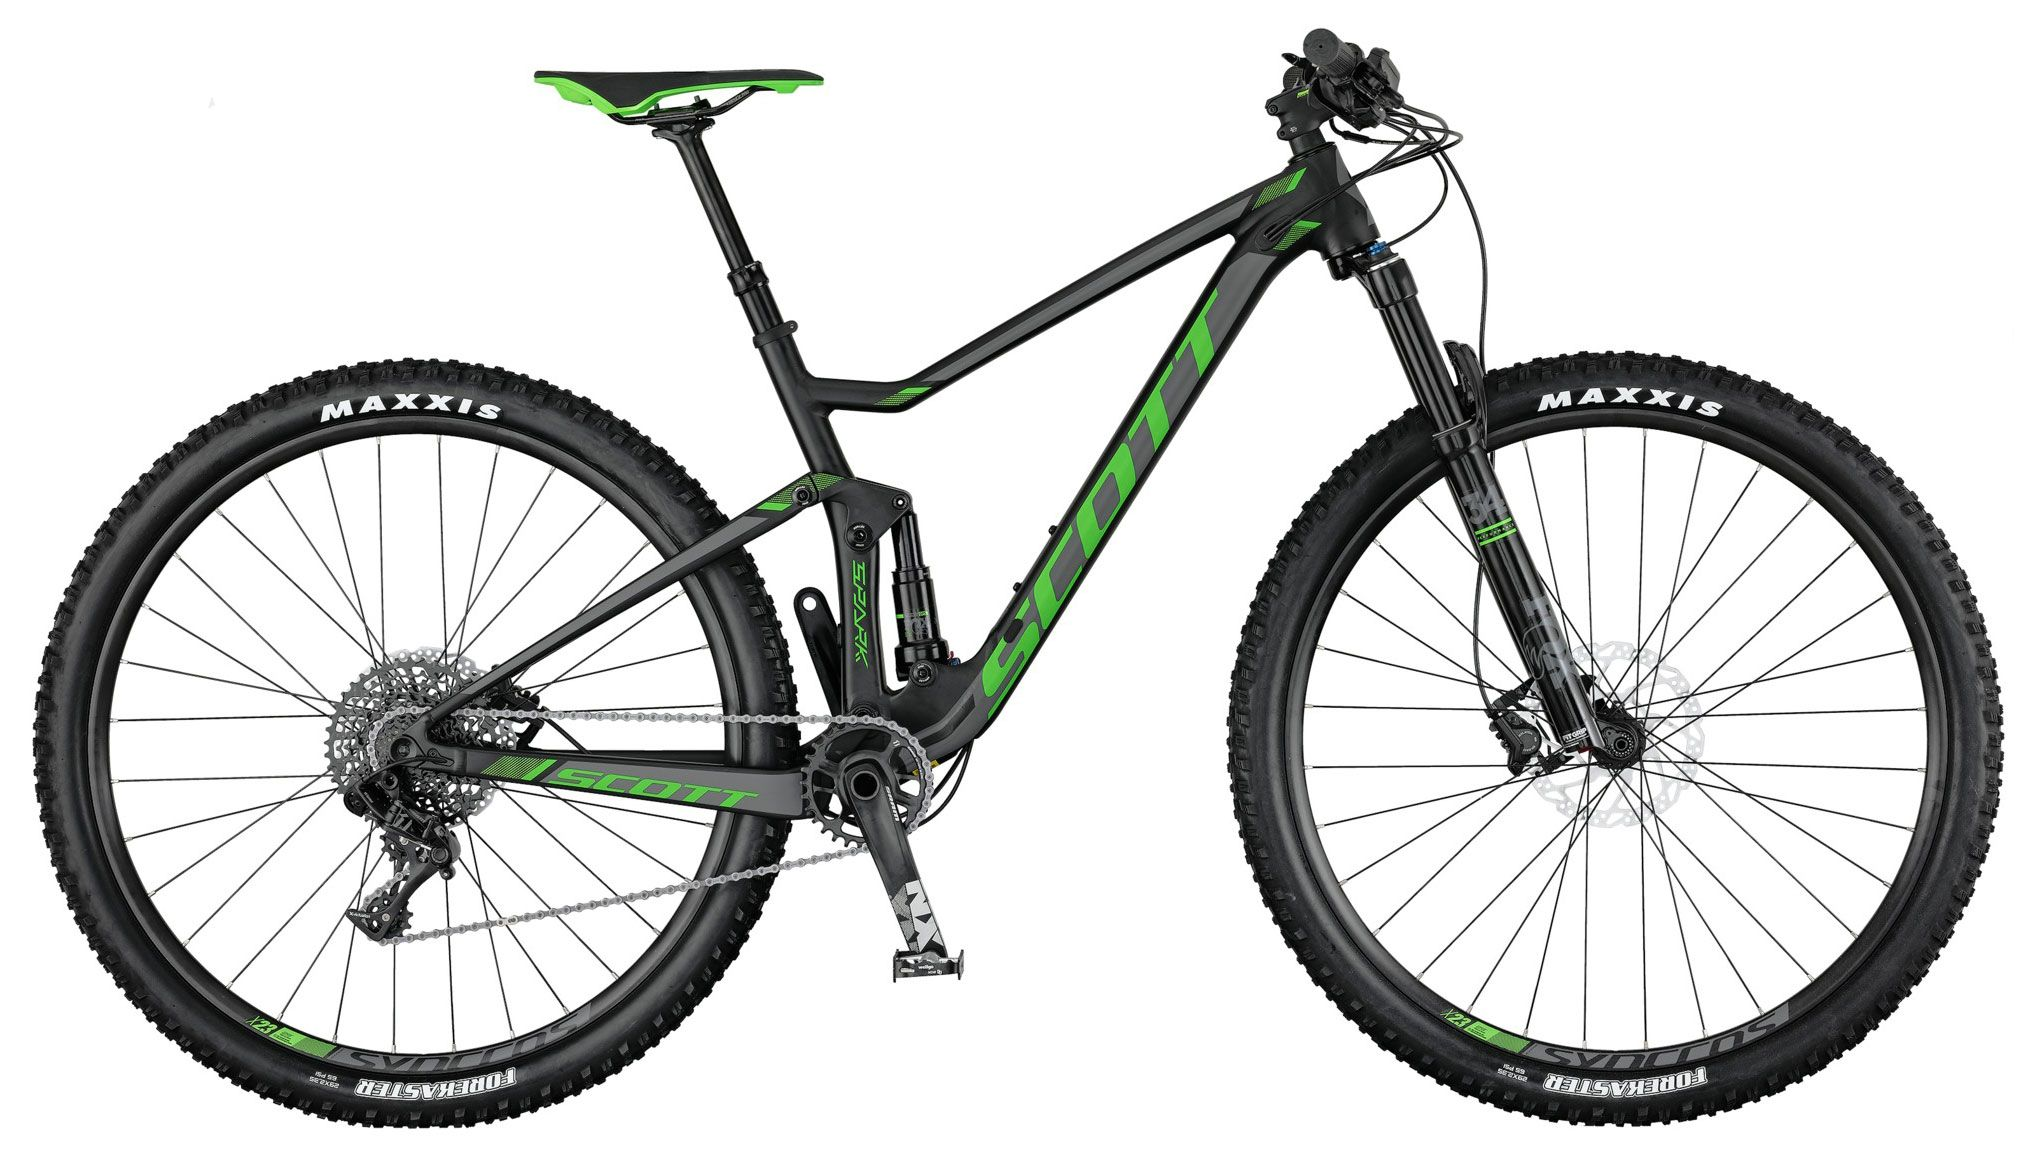 Велосипед Scott Spark 945 2017,  Двухподвесы  - артикул:276038